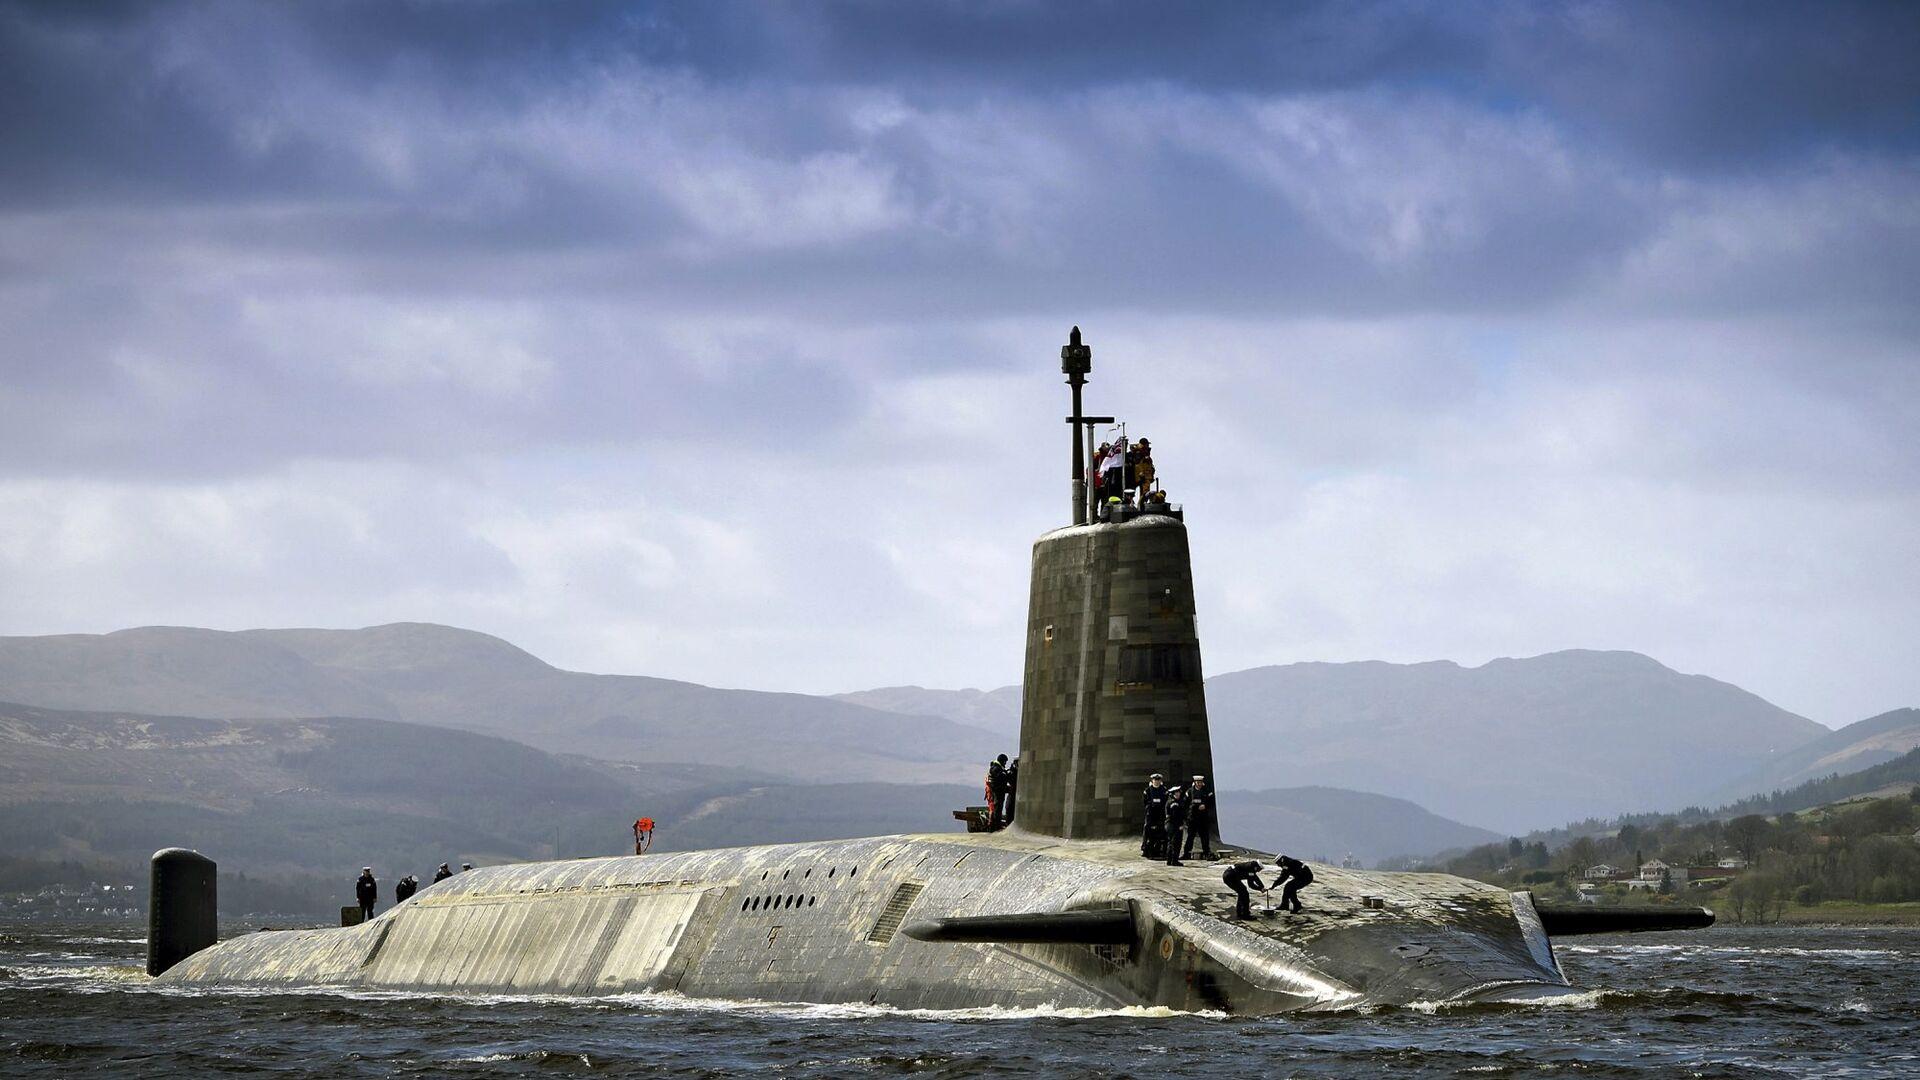 Подводная лодка Vigilant ВМС Великобритании с ракетами Trident II D5 на борту - РИА Новости, 1920, 19.11.2018